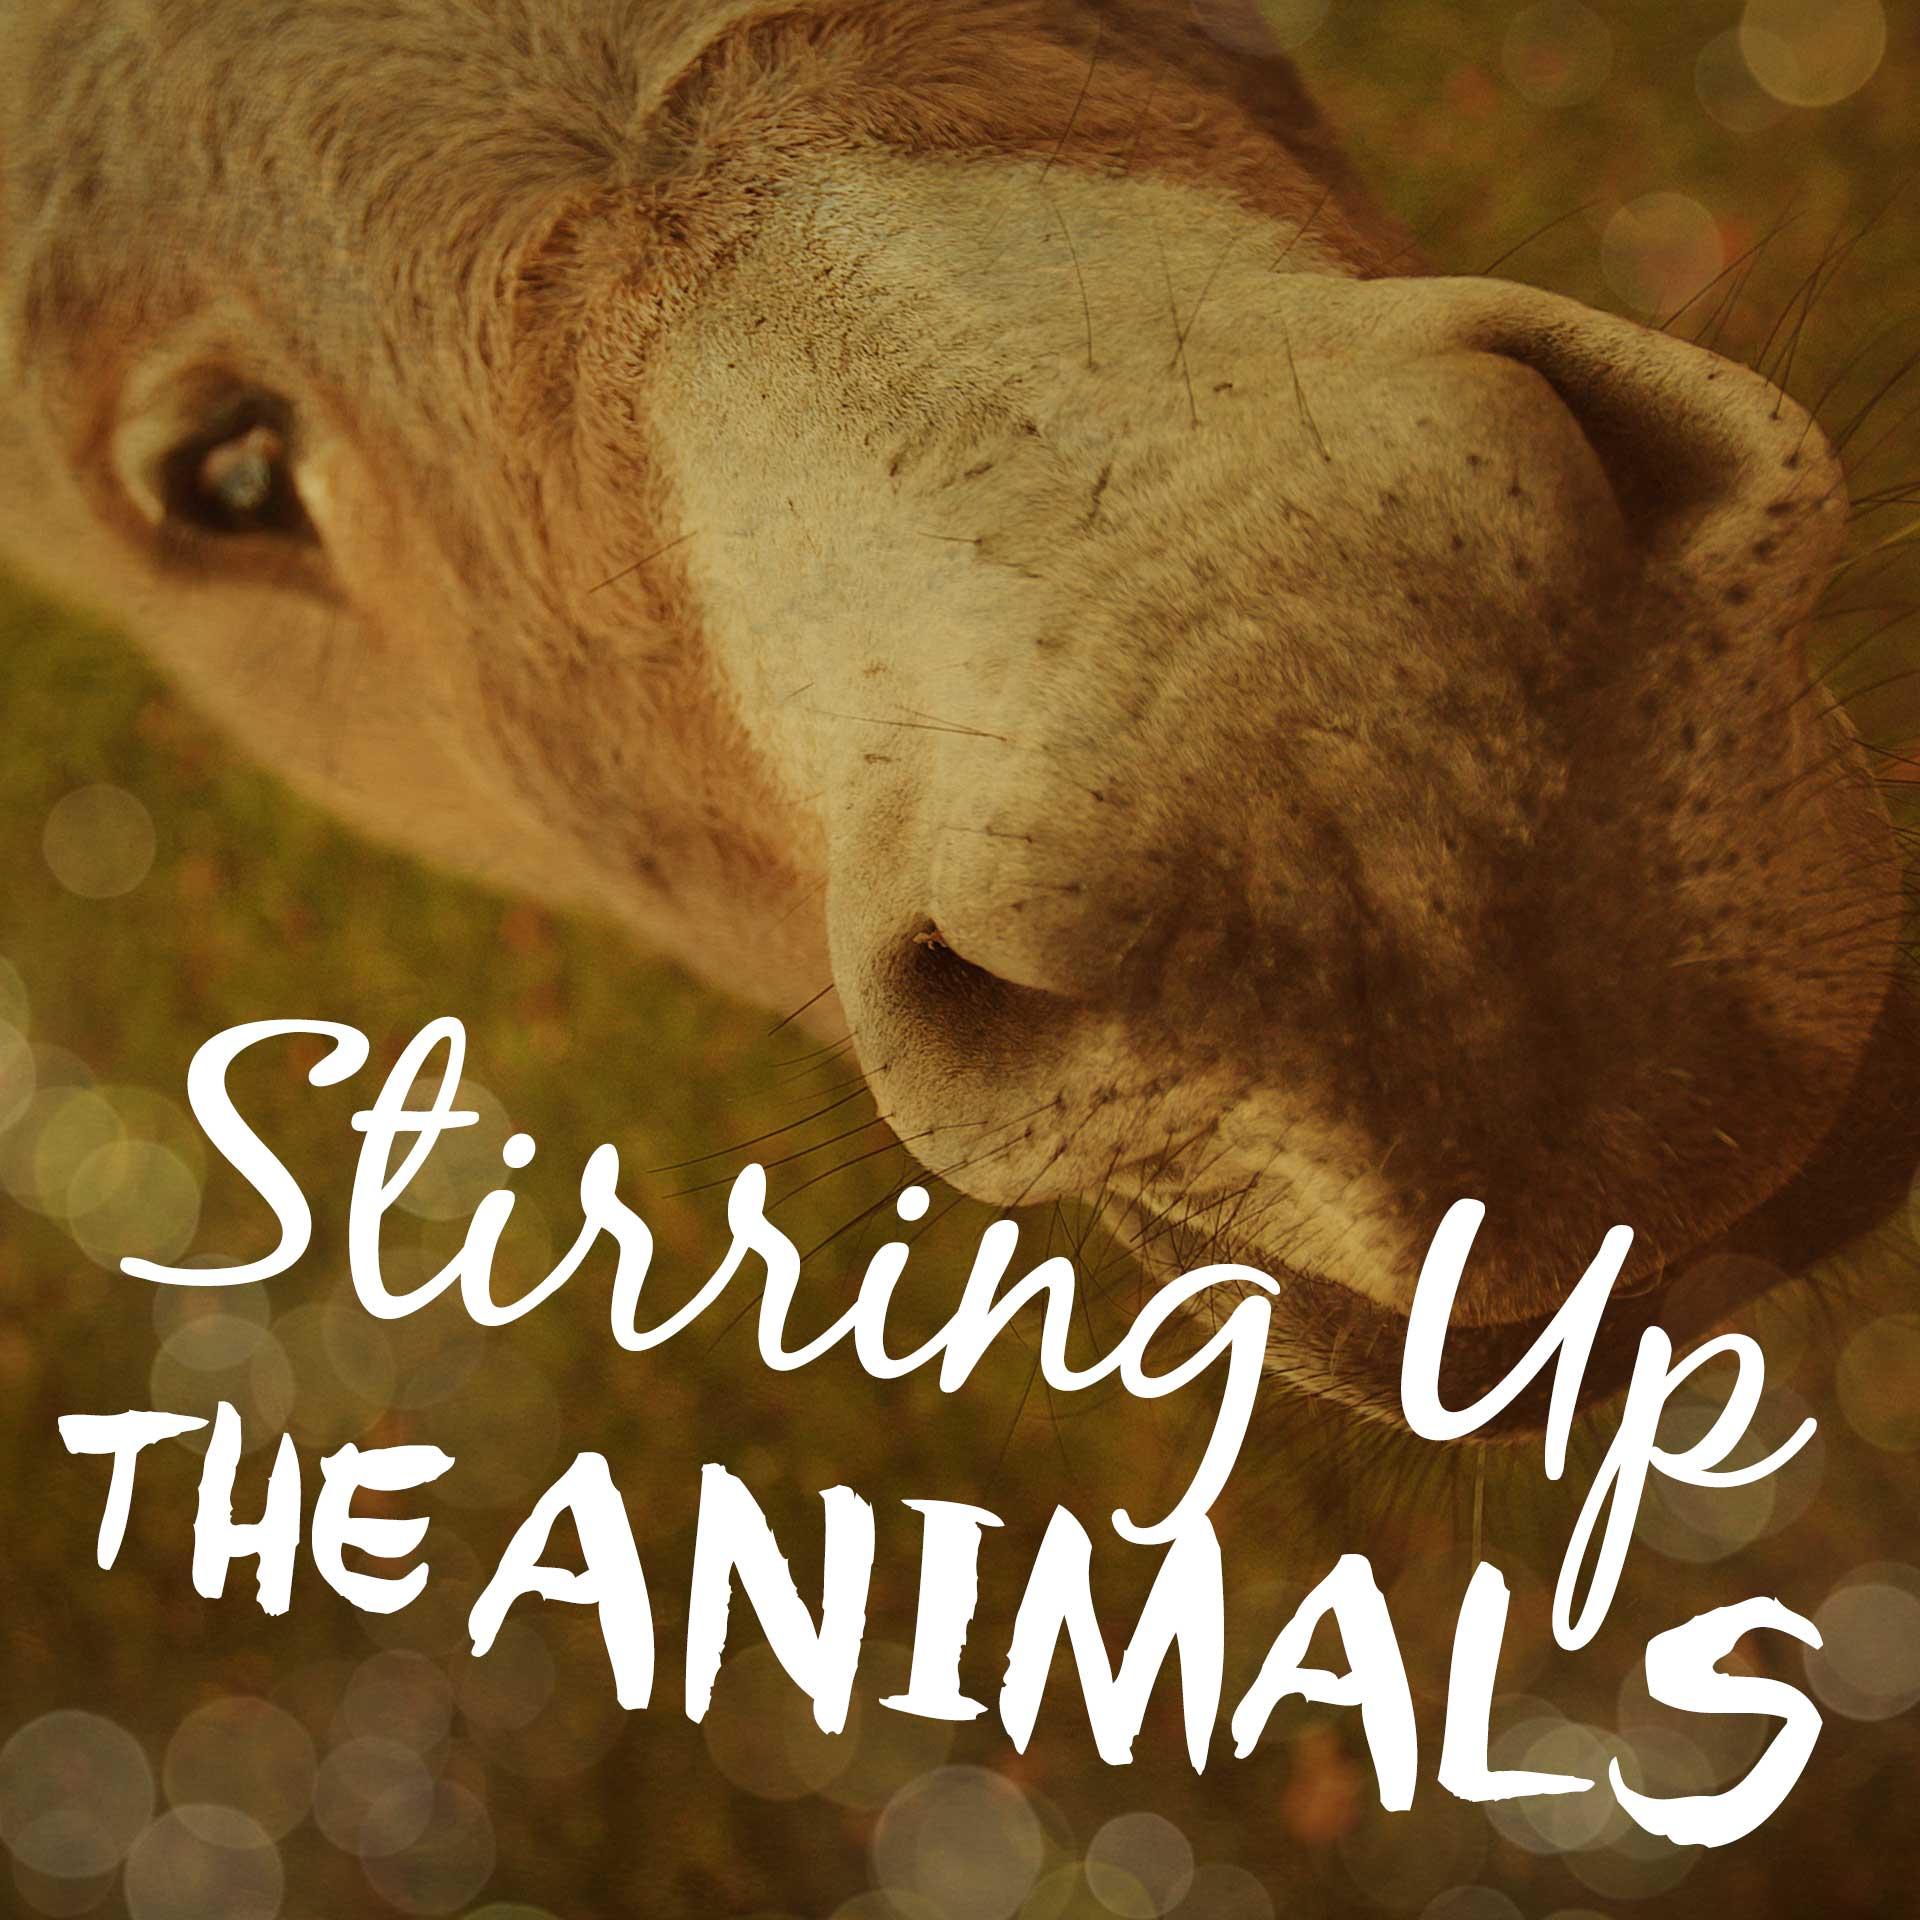 Stirring Up The Animals